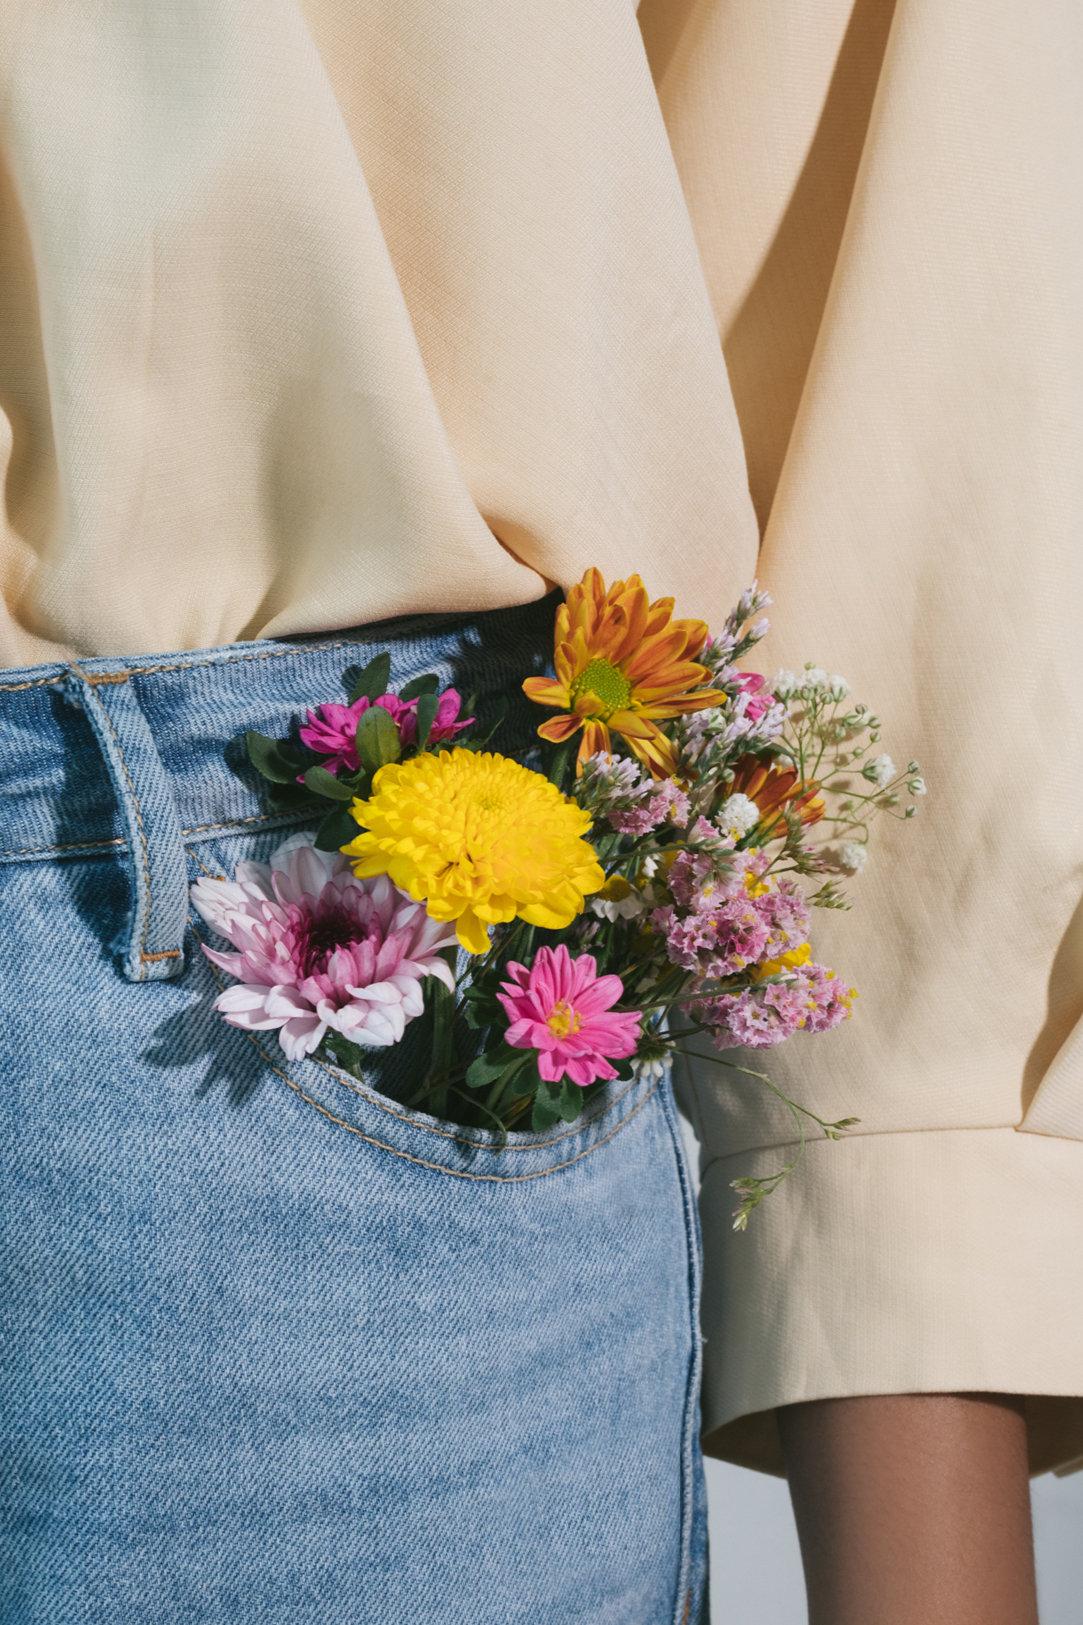 Flower & Self-Love (Group)